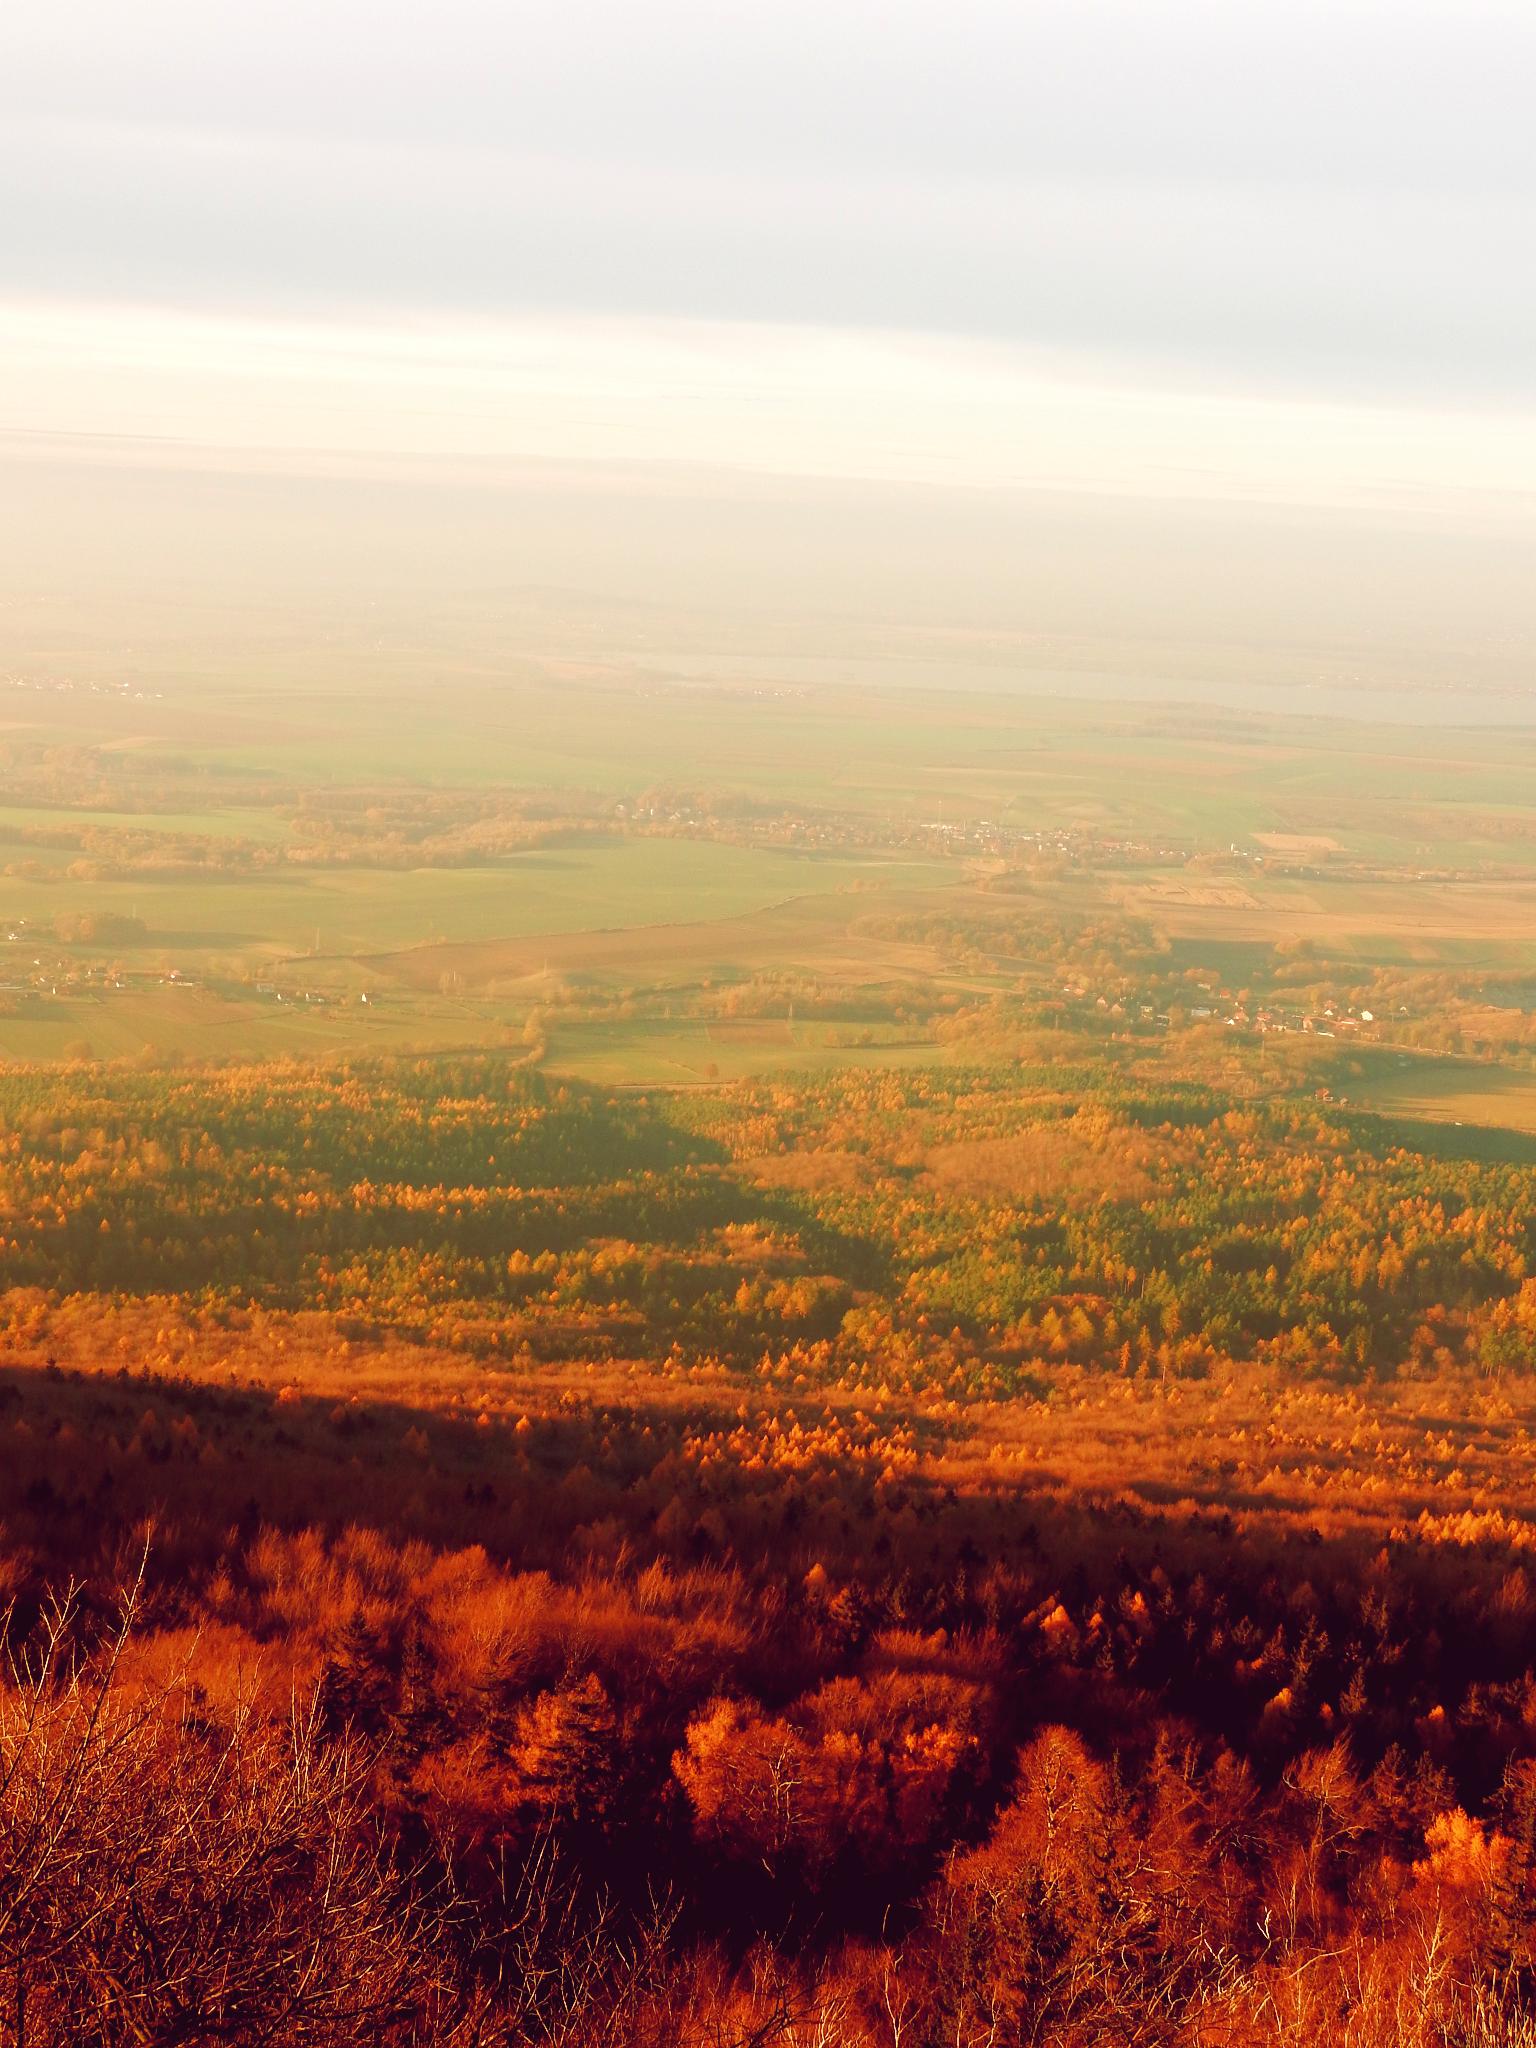 Ślężański Park Krajobrazowy Ślęża Landscape Park